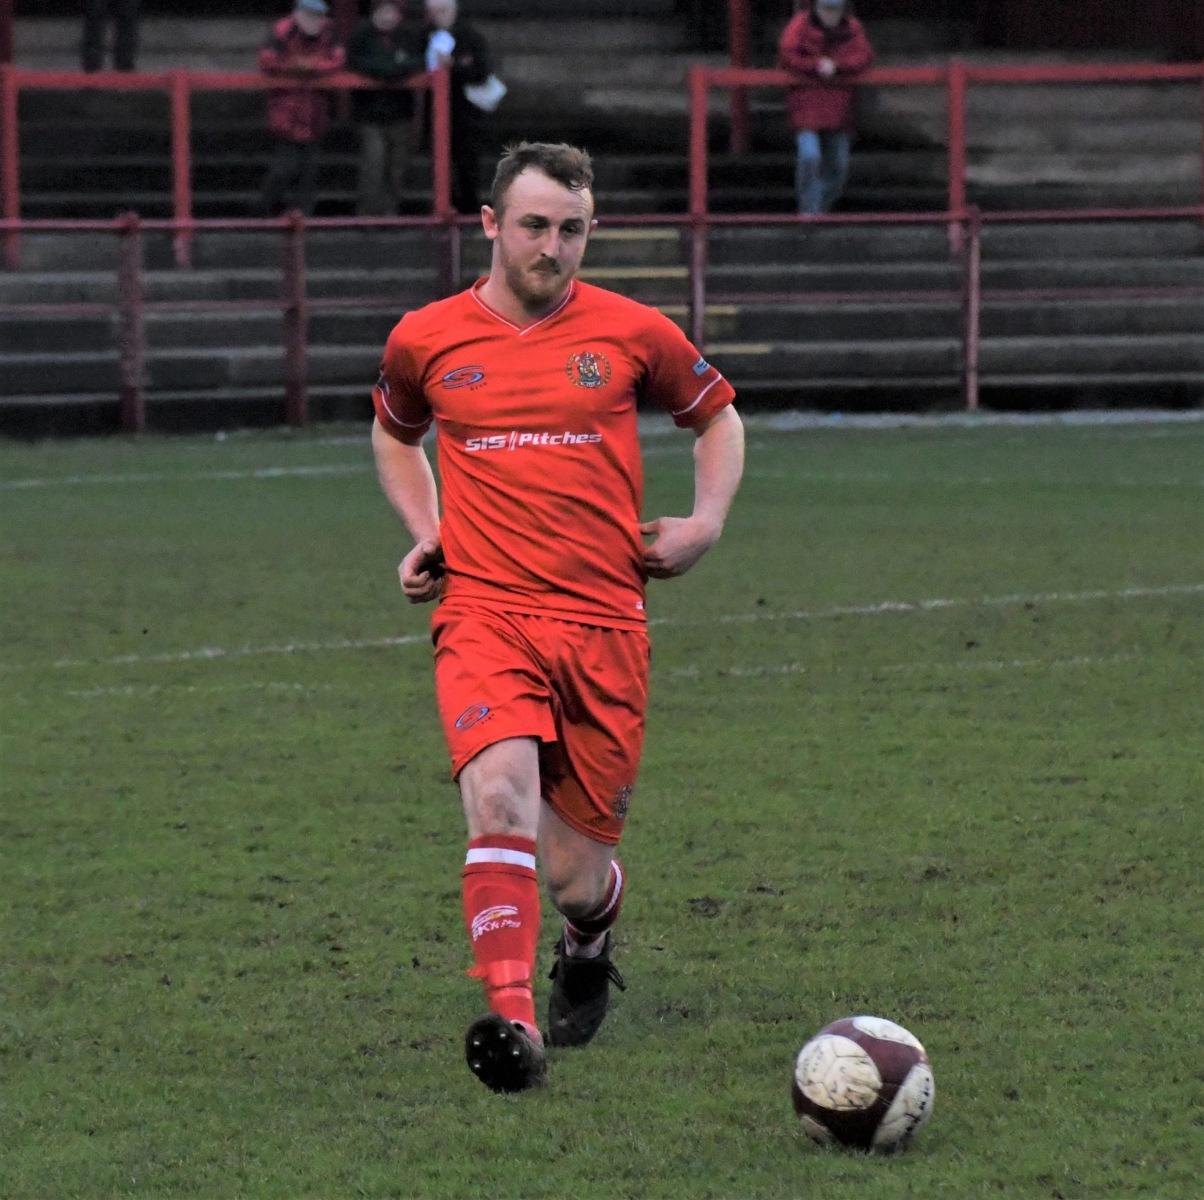 Workington-Reds-v-Trafford-Ben-Challis-13-scaled